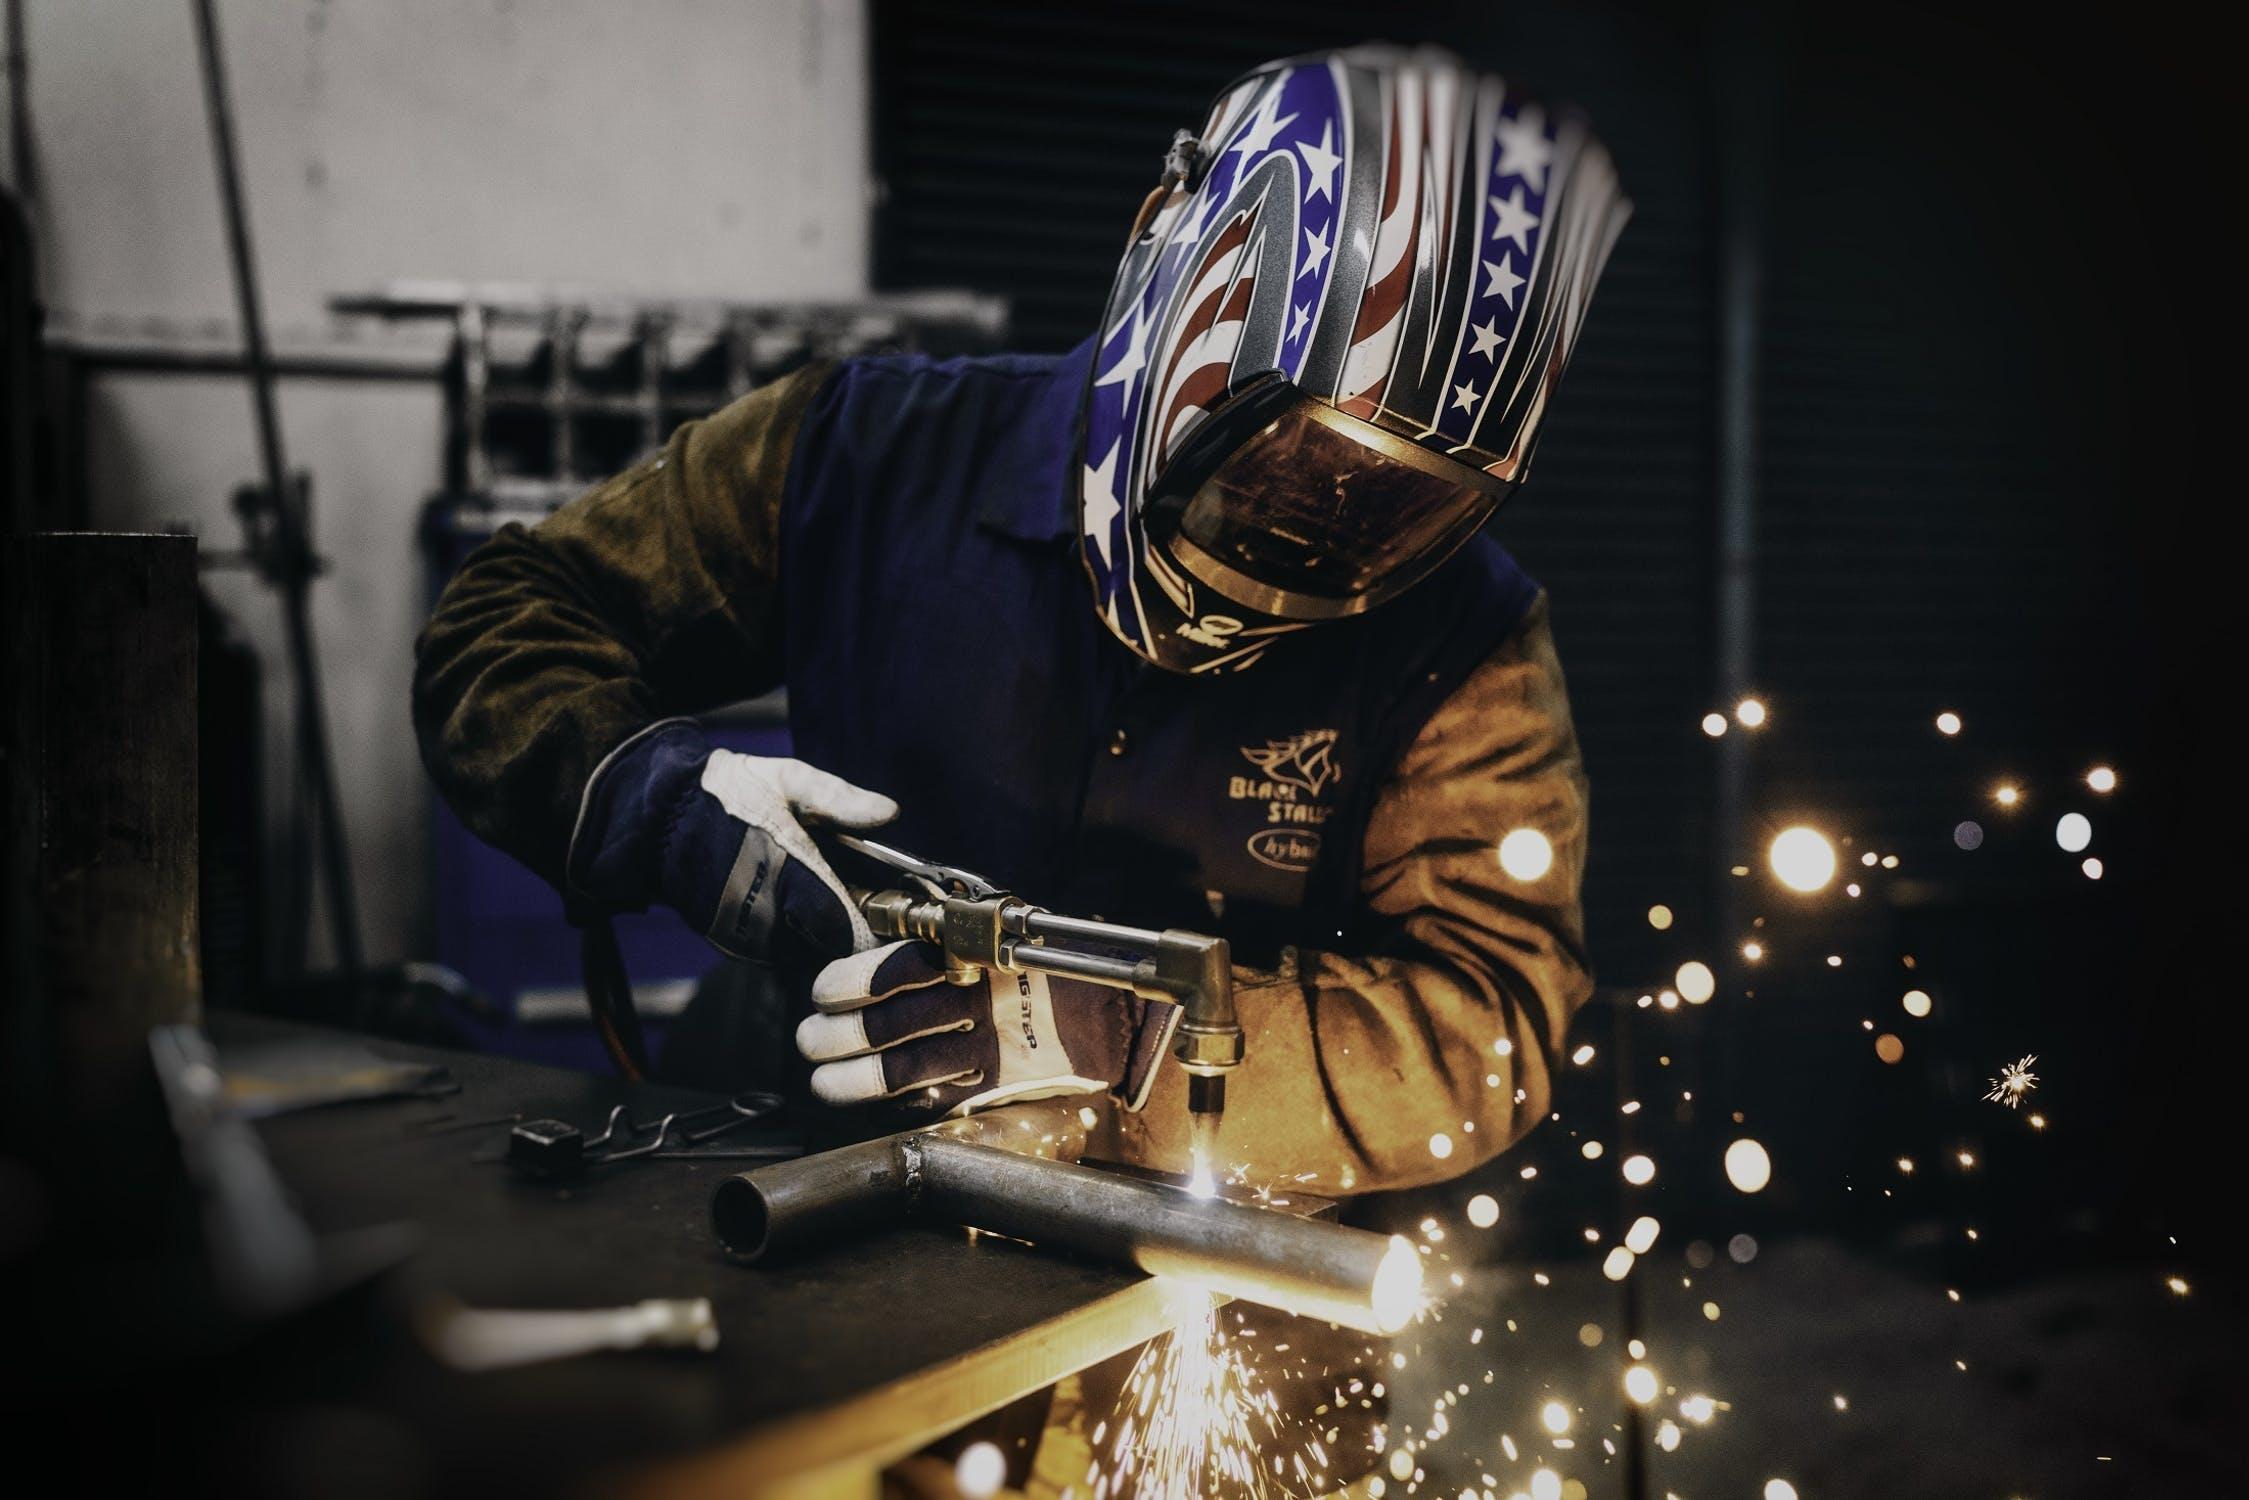 Man welding.